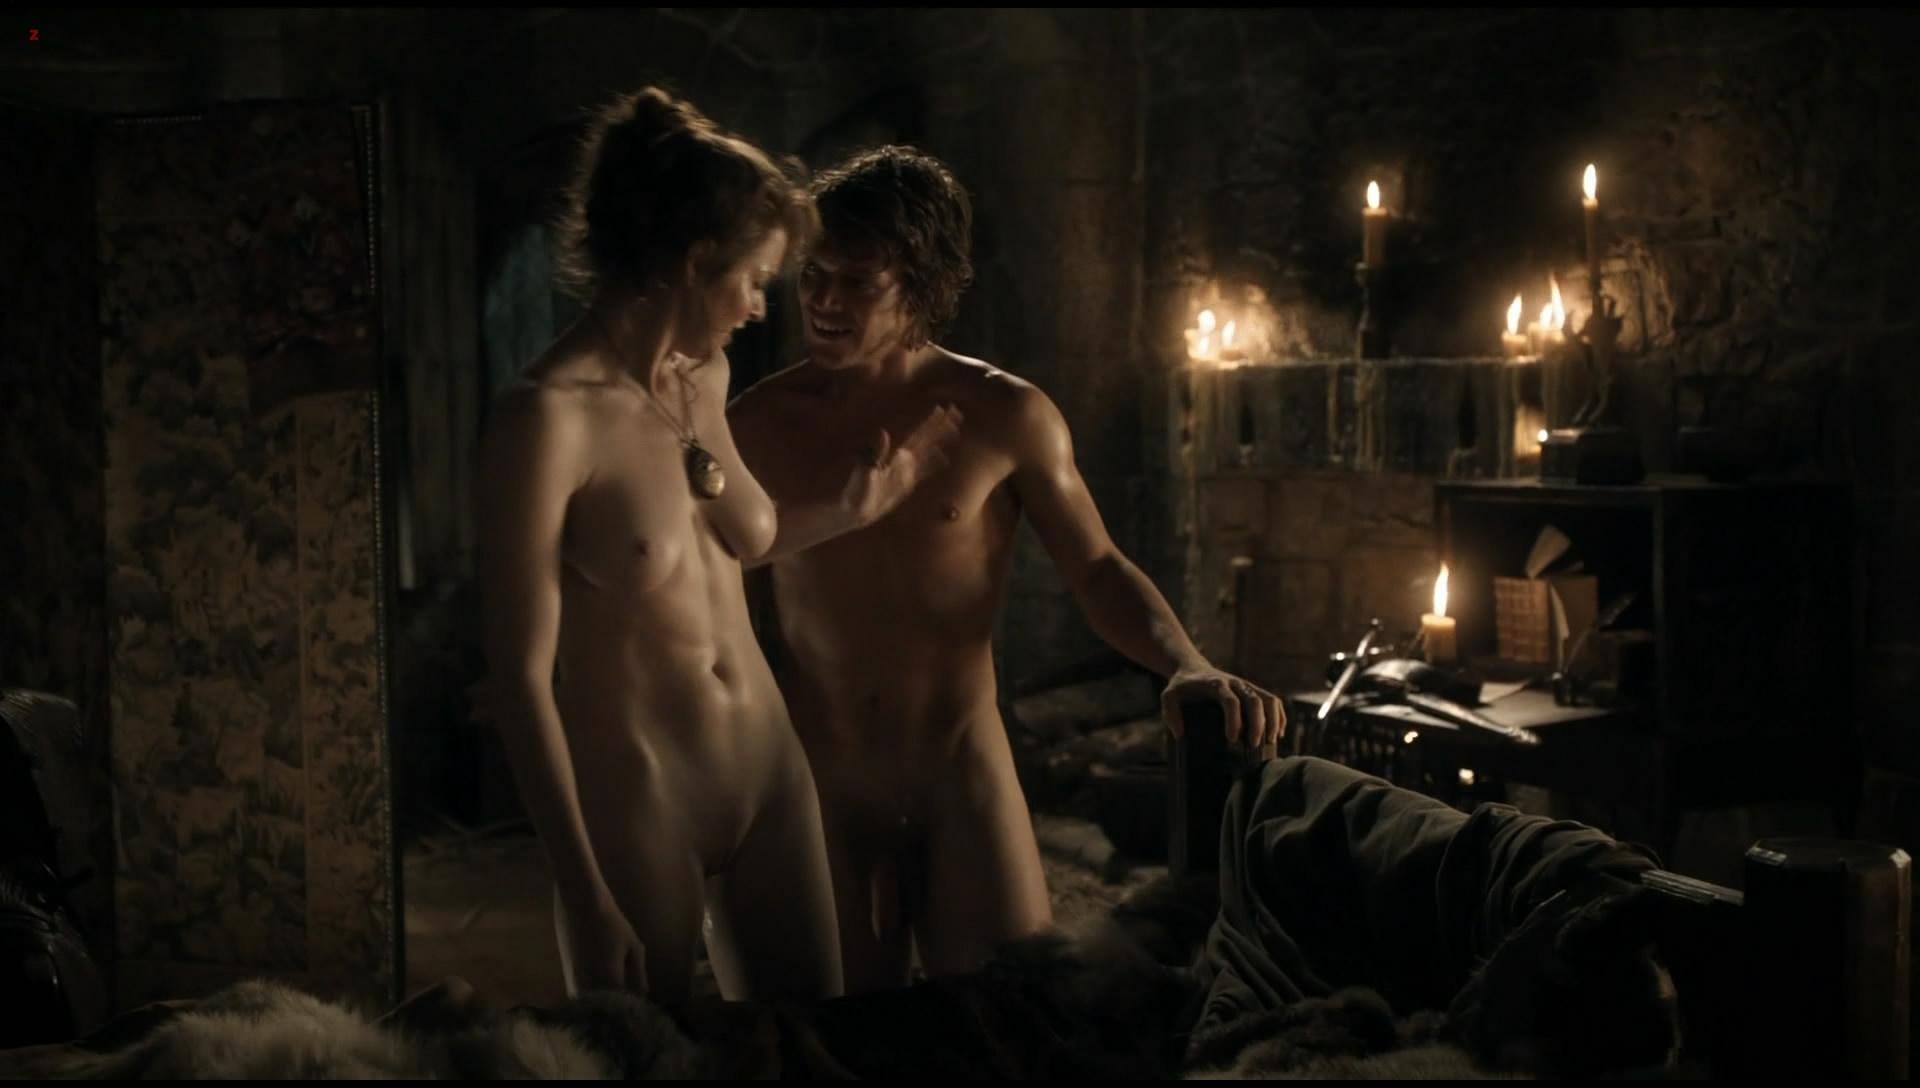 voyna-prestolov-seks